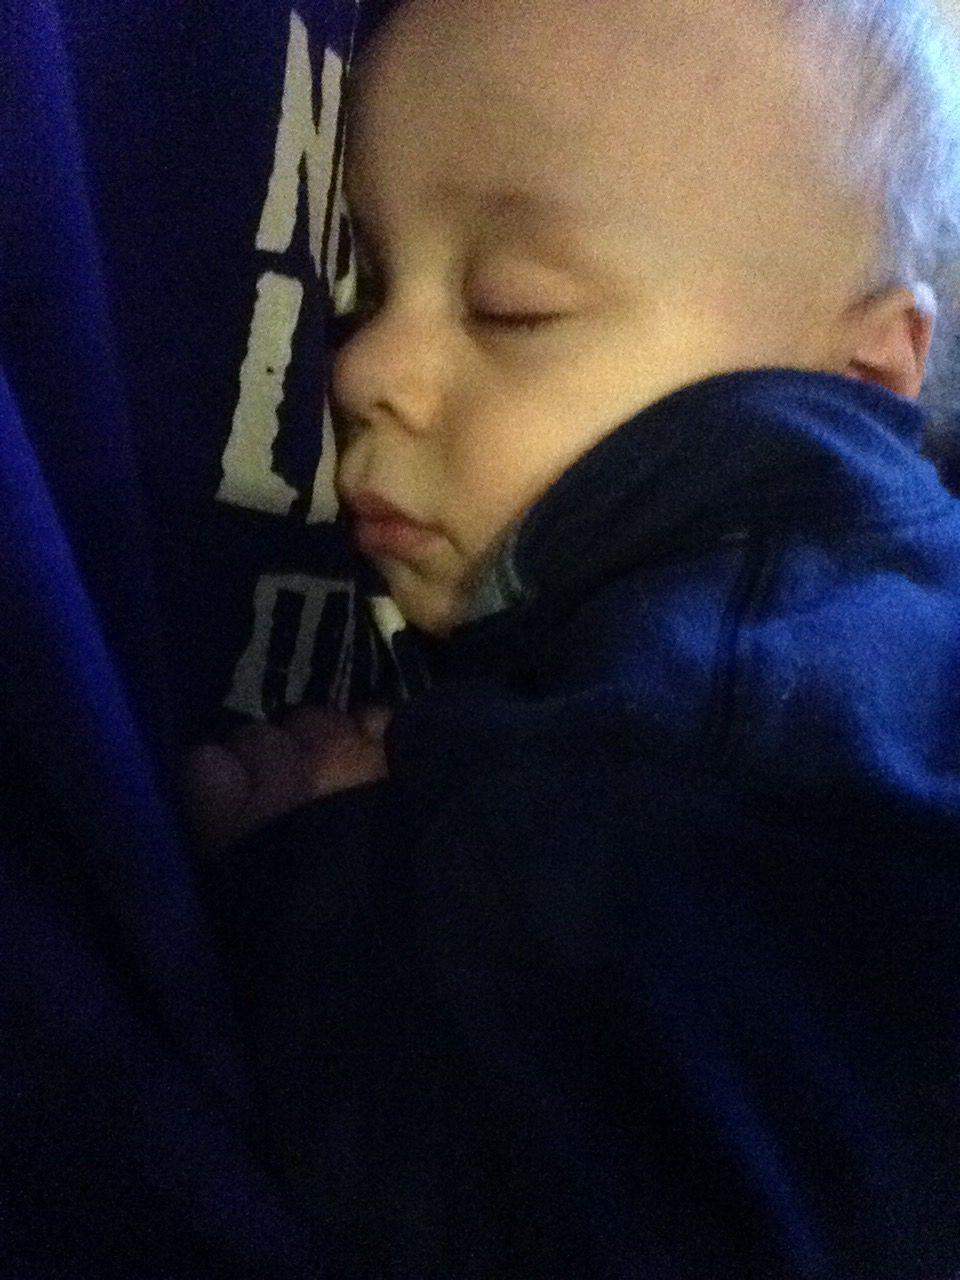 Now asleep w a full belly